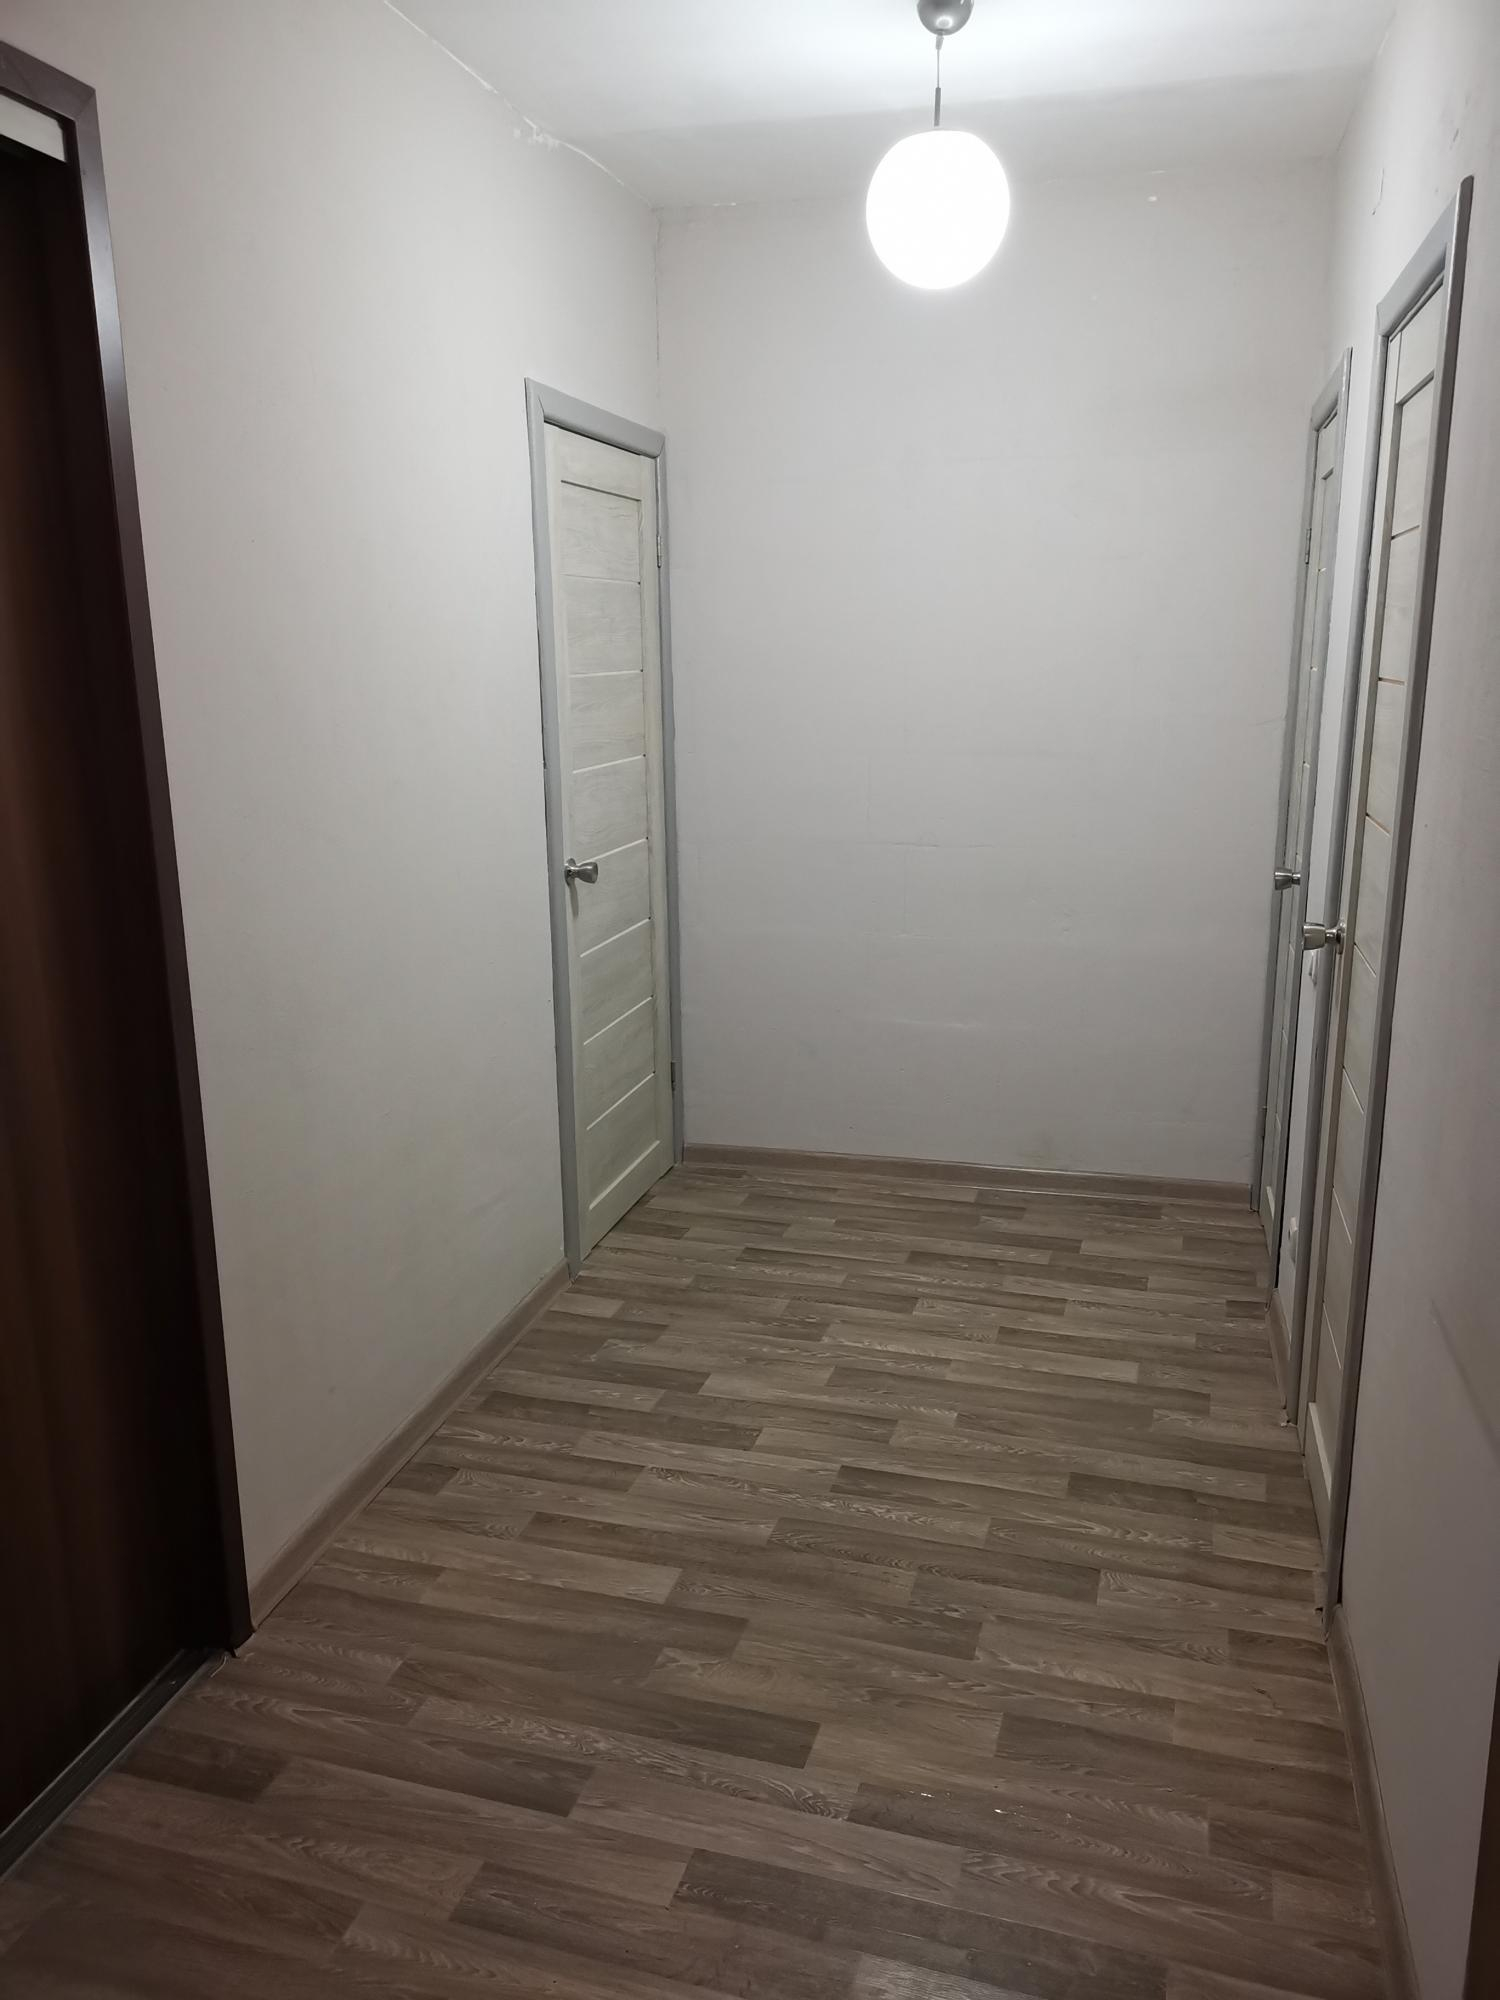 1к квартира улица Куйбышева, 97 | 15000 | аренда в Красноярске фото 7